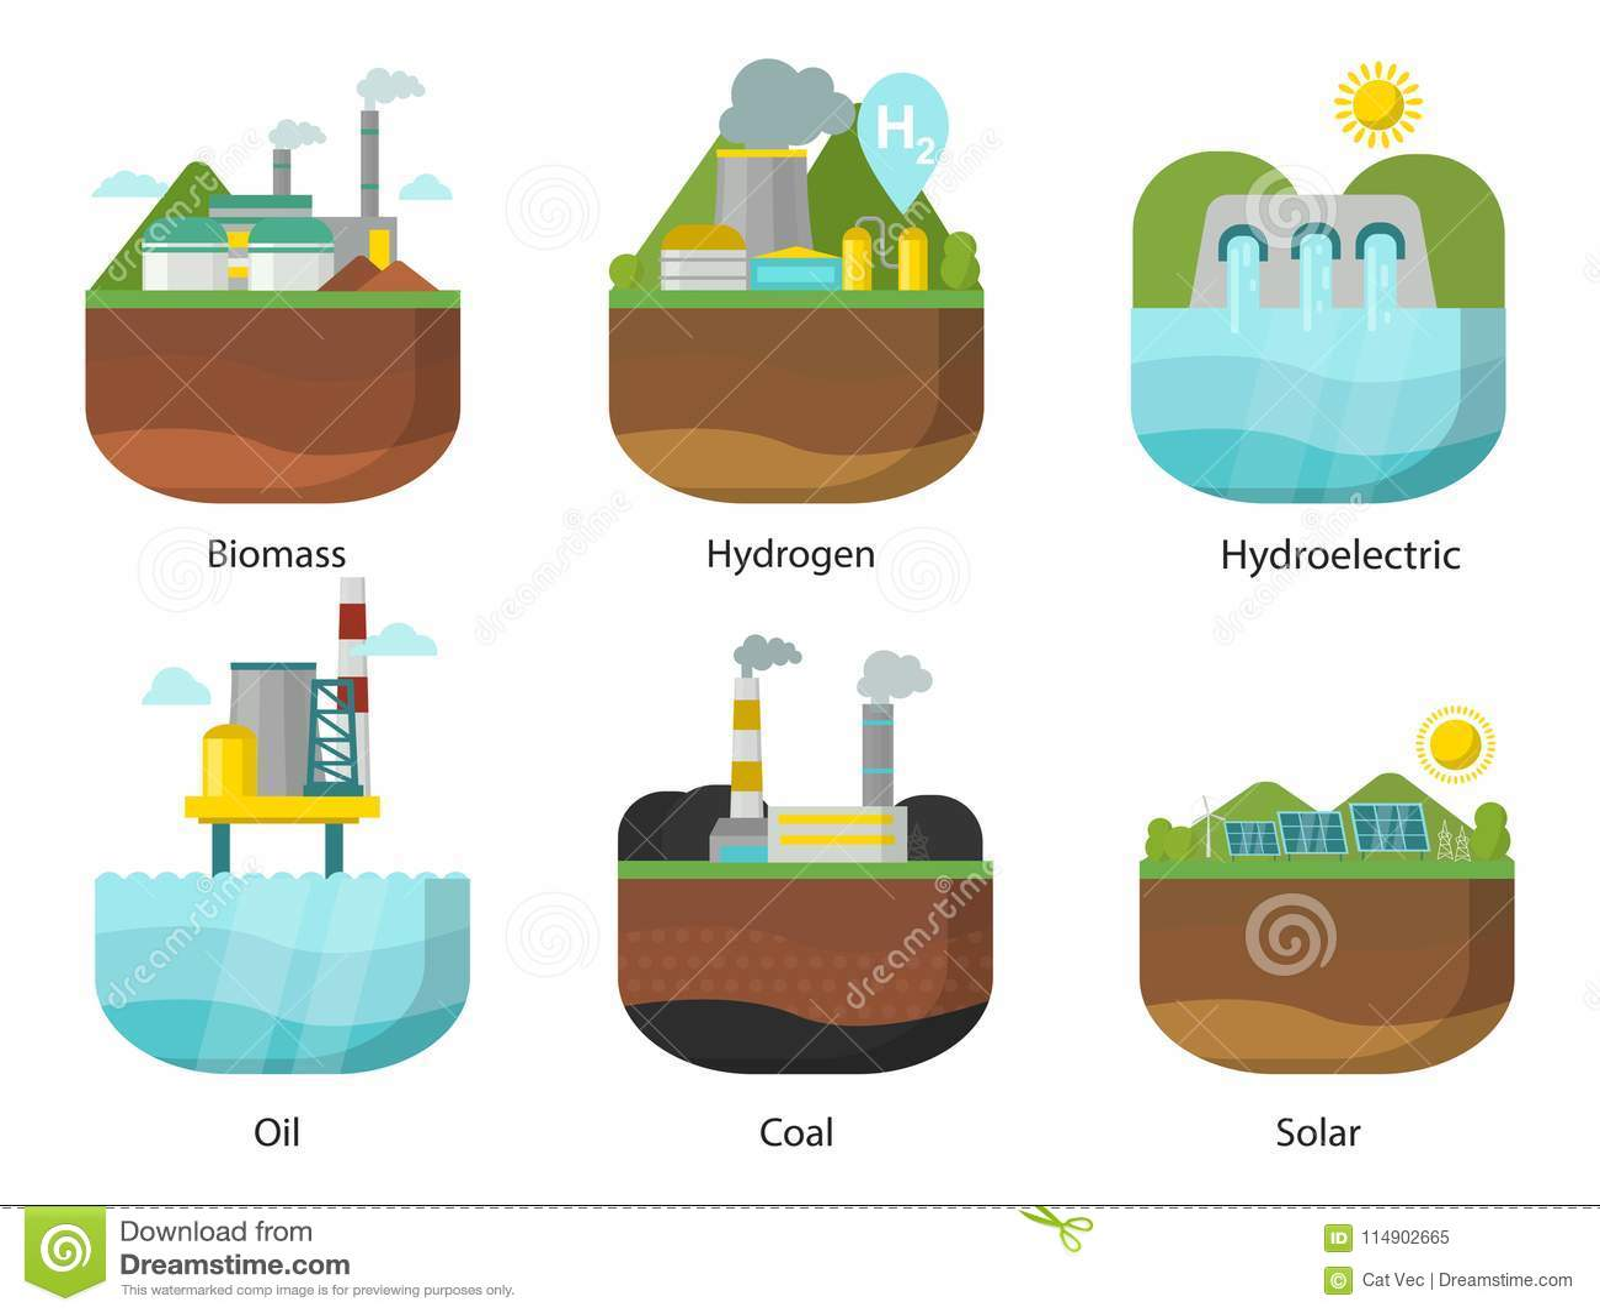 Generation Energy Types Power Plant Vector Renewable Alternative Hydrogen Diagram Download Source Solar And Tidal Wind